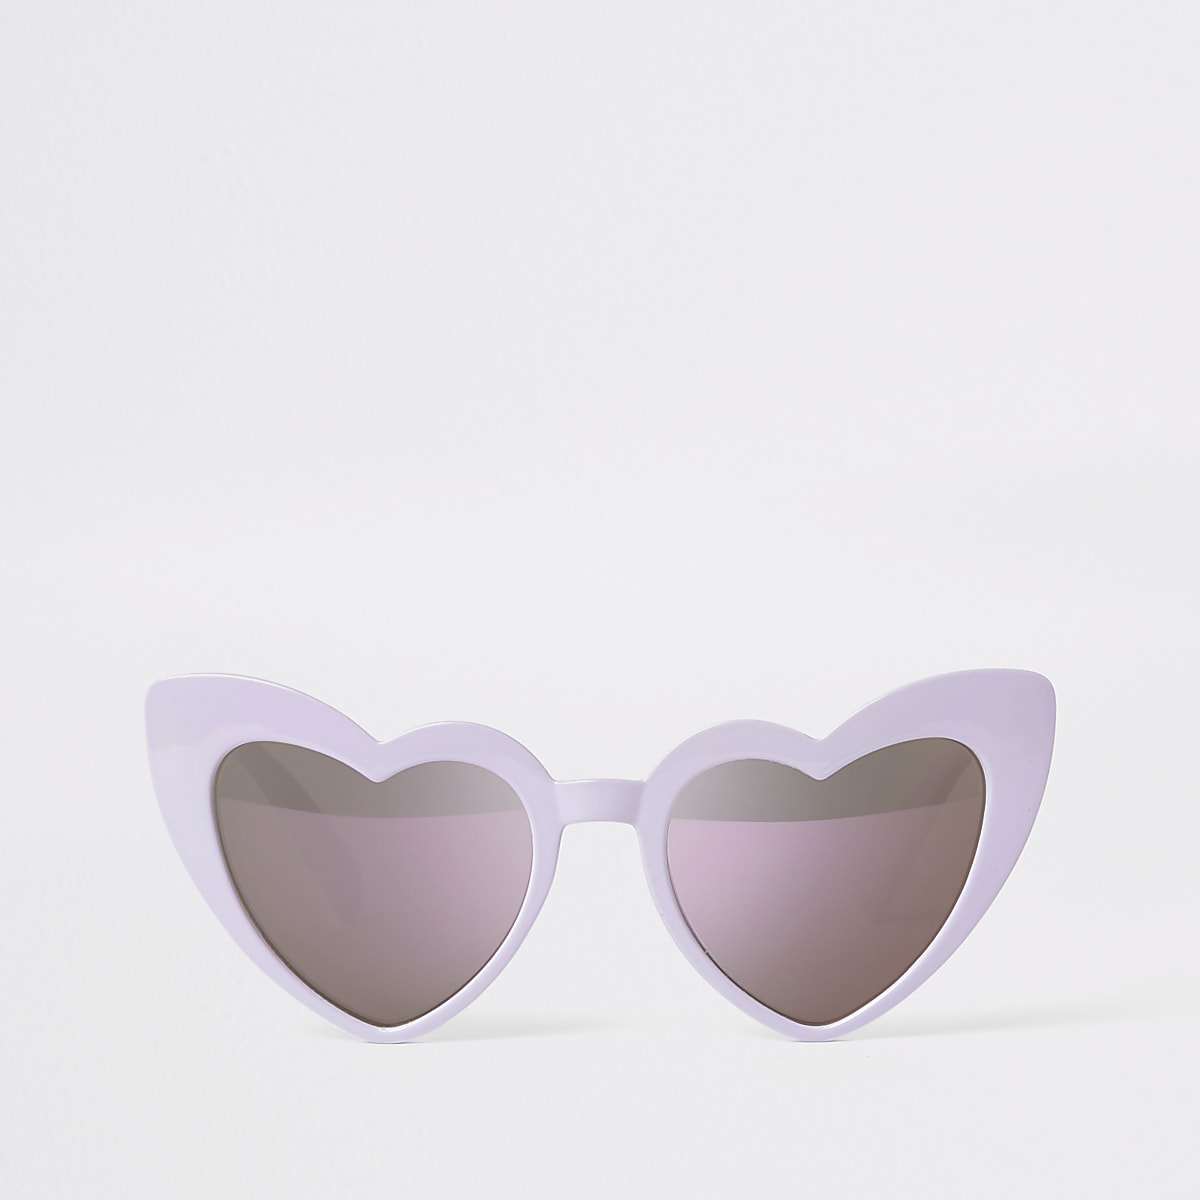 Girls purple heart cat eye sunglasses